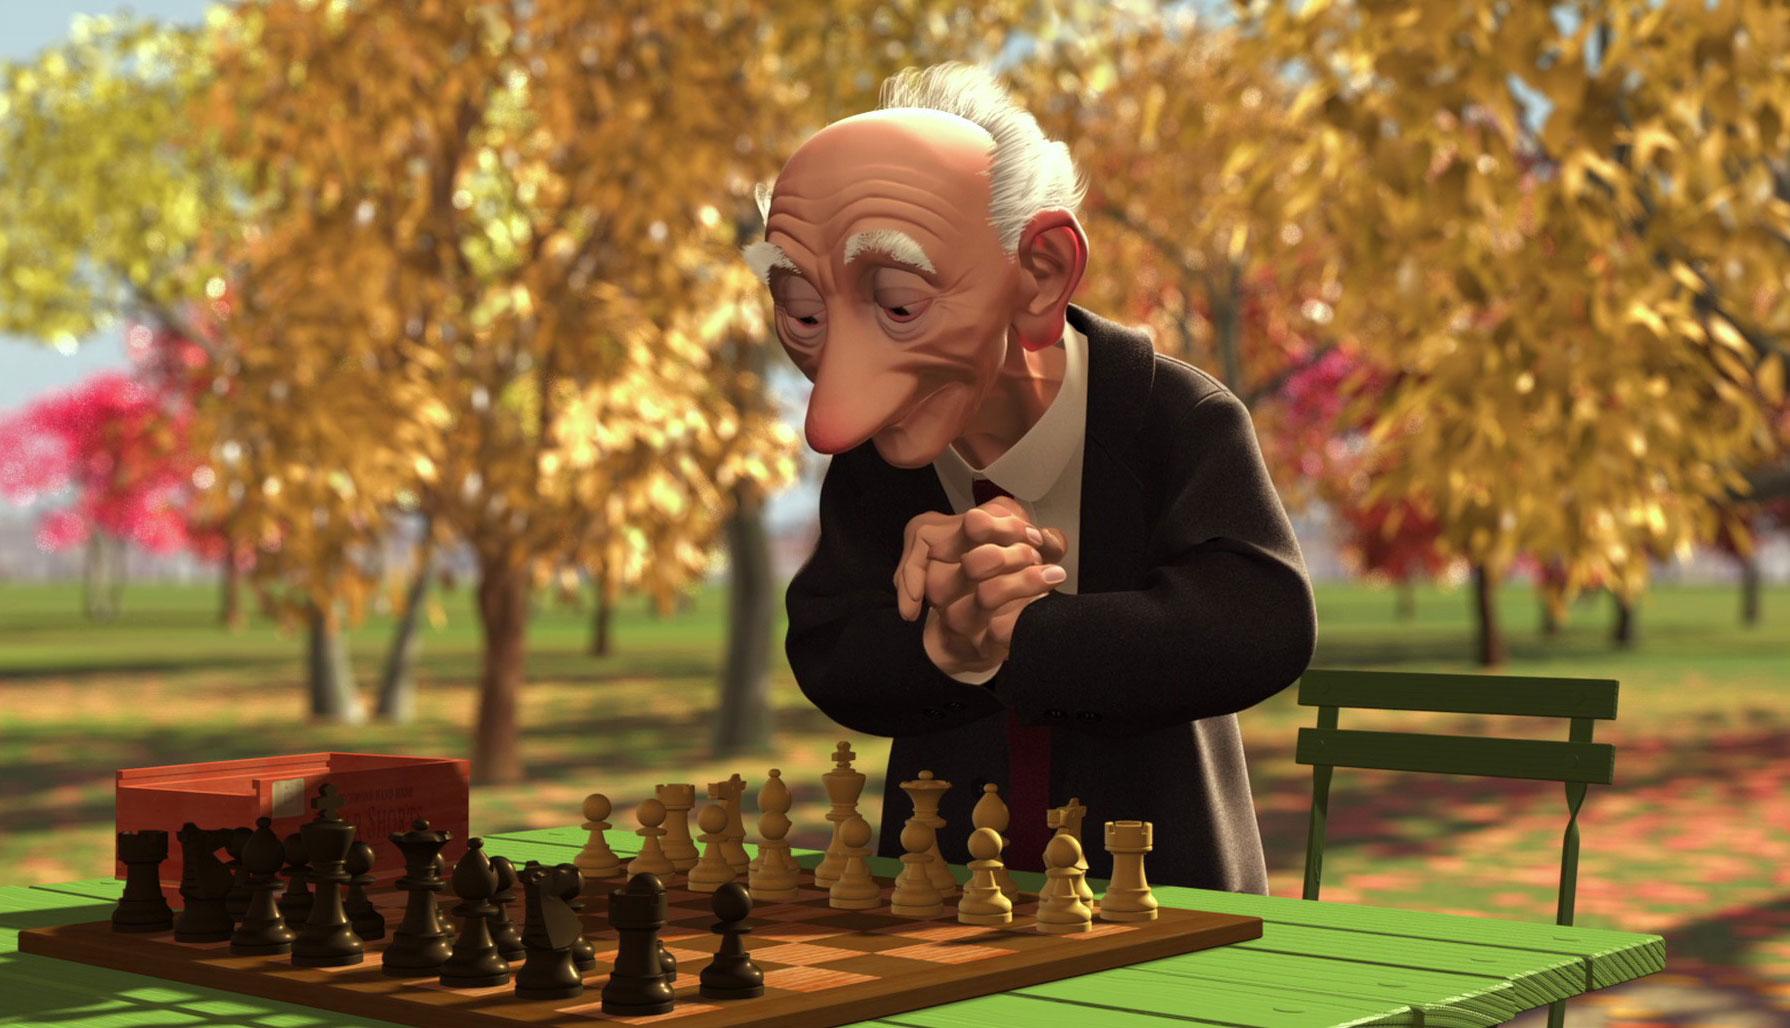 image joueur échec geri game disney pixar